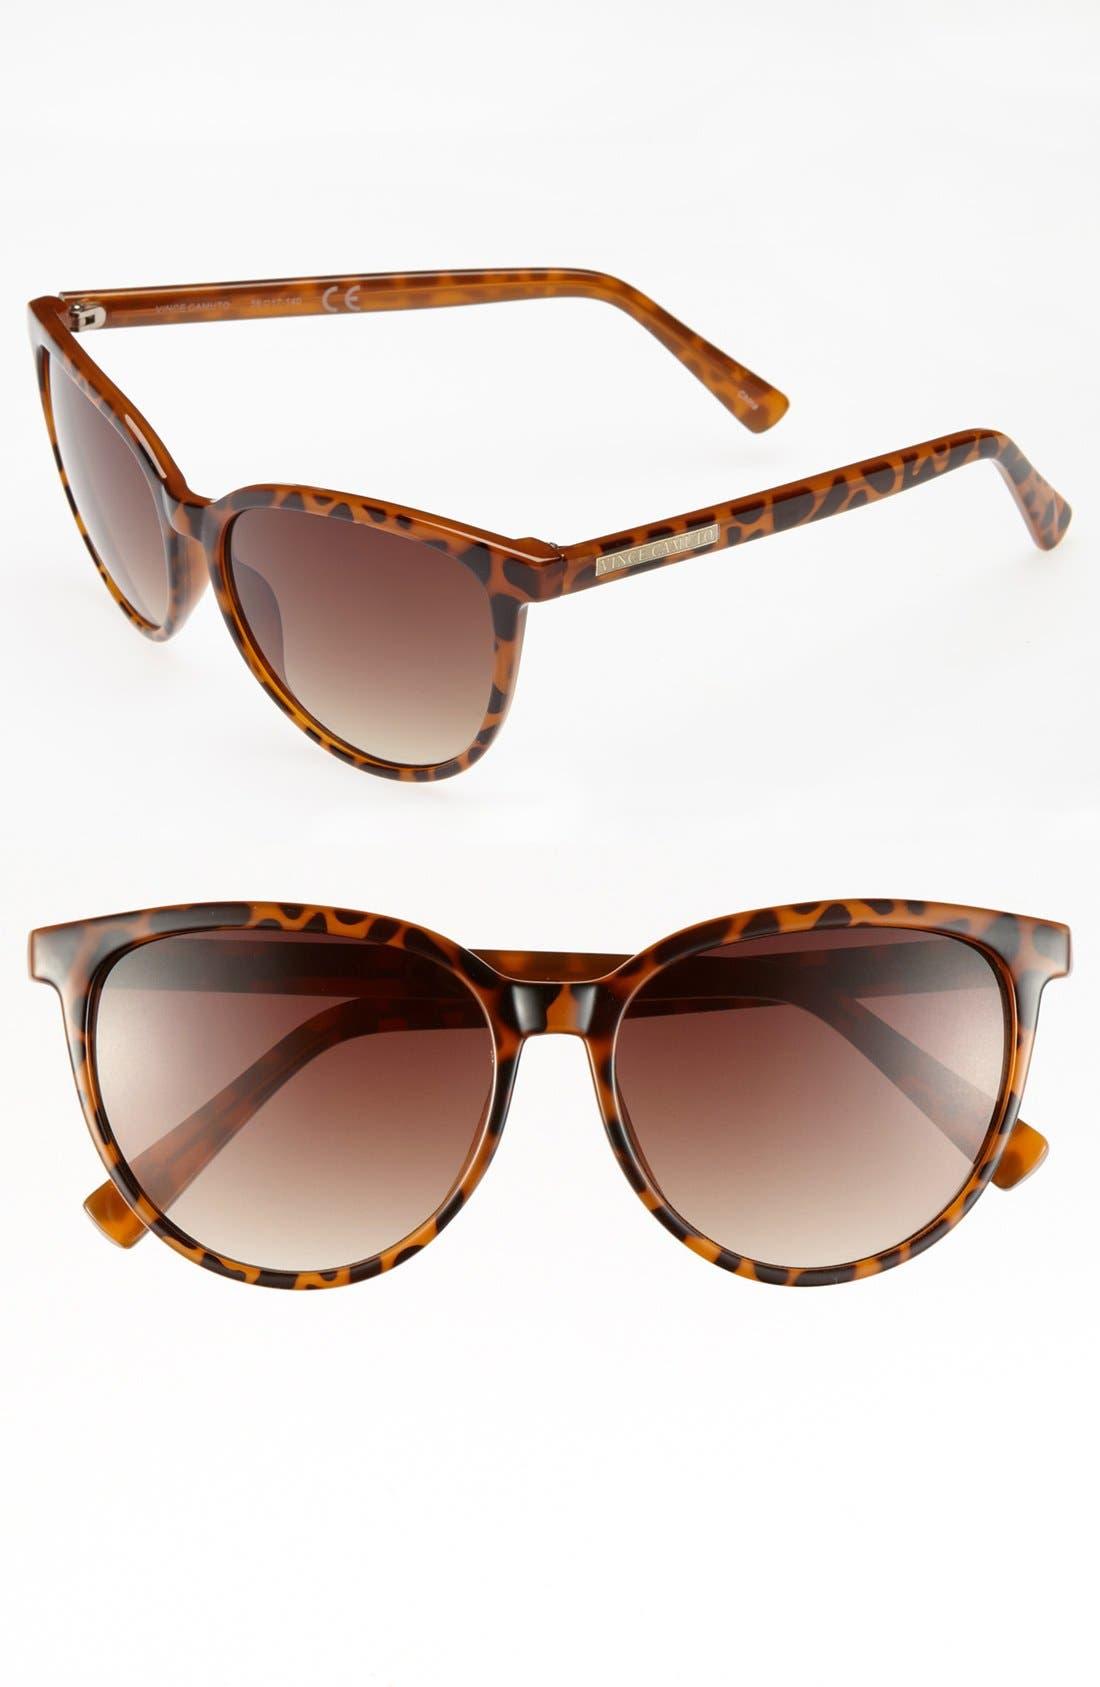 Main Image - Vince Camuto 55mm Retro Sunglasses